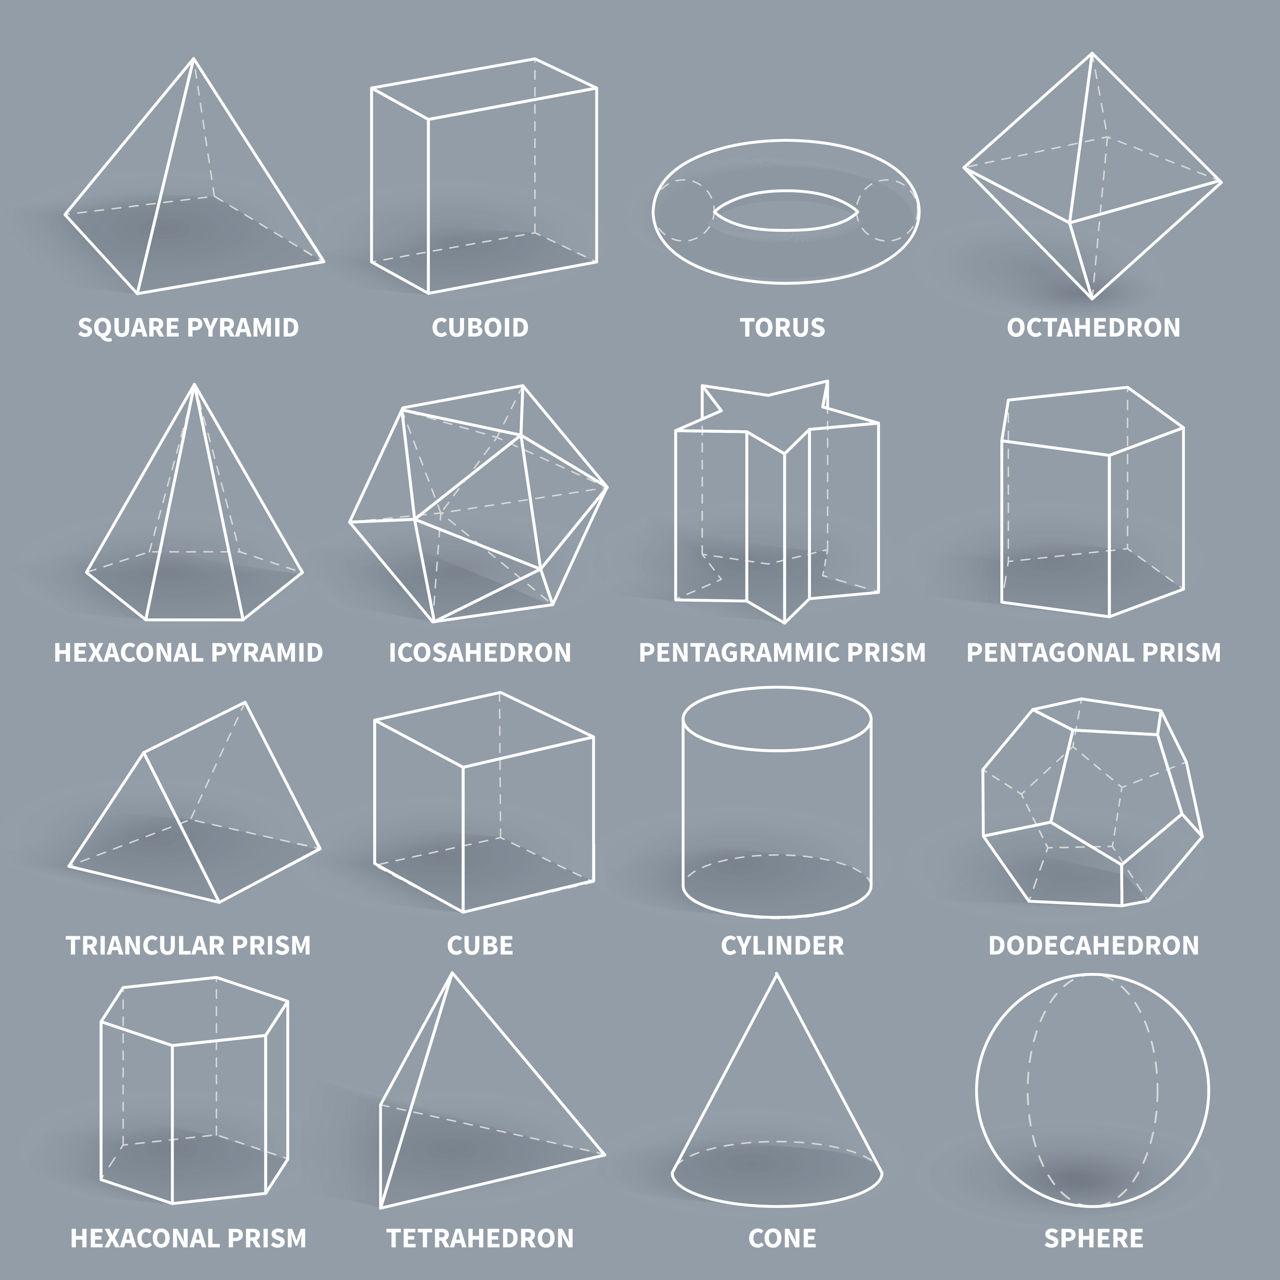 1280-813053080-set-of-geometric-shapes.jpg